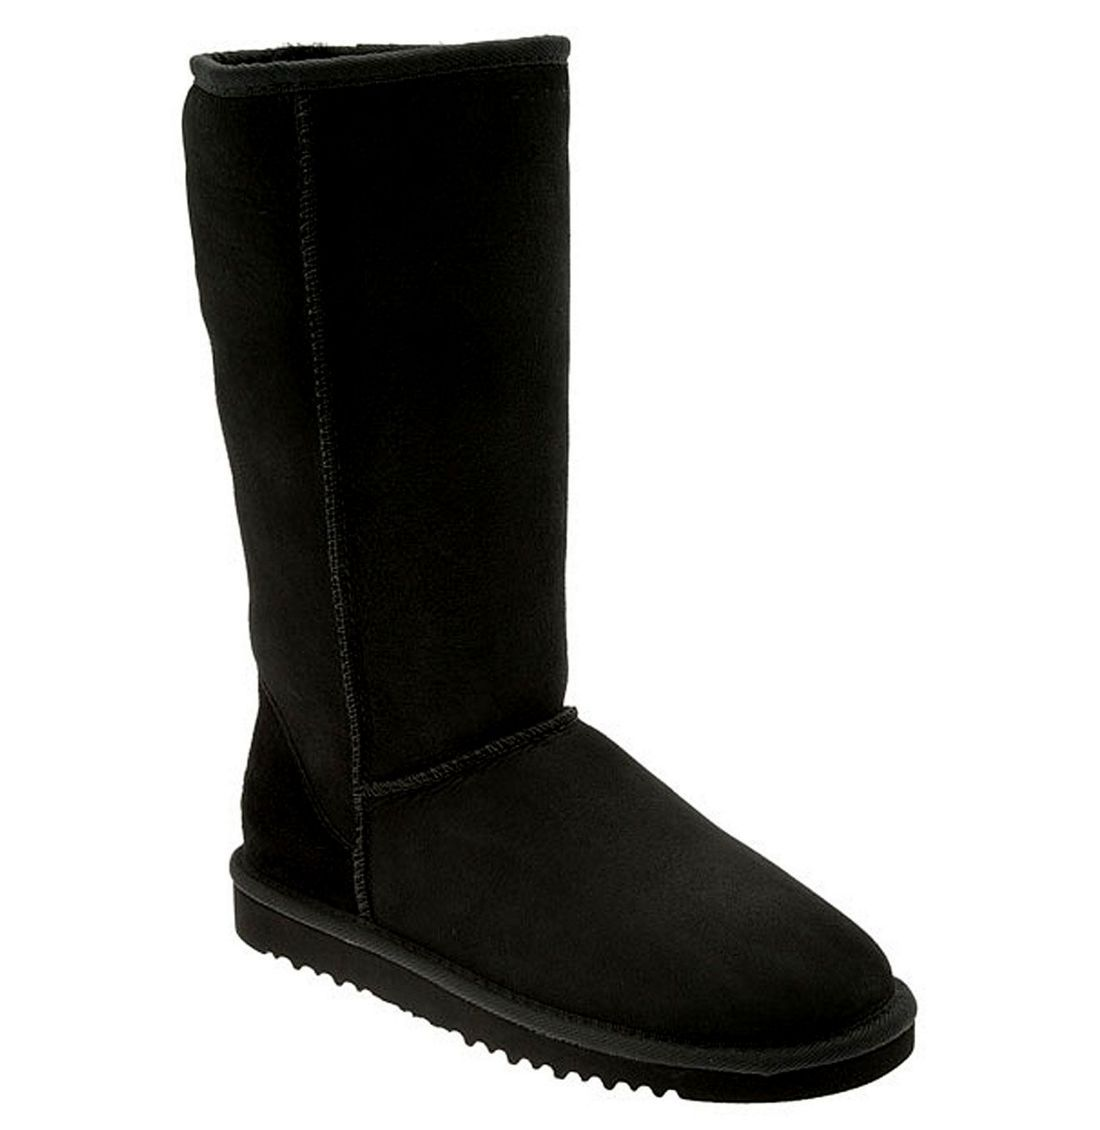 UGG® (Femmes) Australia UGG® Classic   Tall Boot (Femmes)   726d156 - freemetalalbums.info